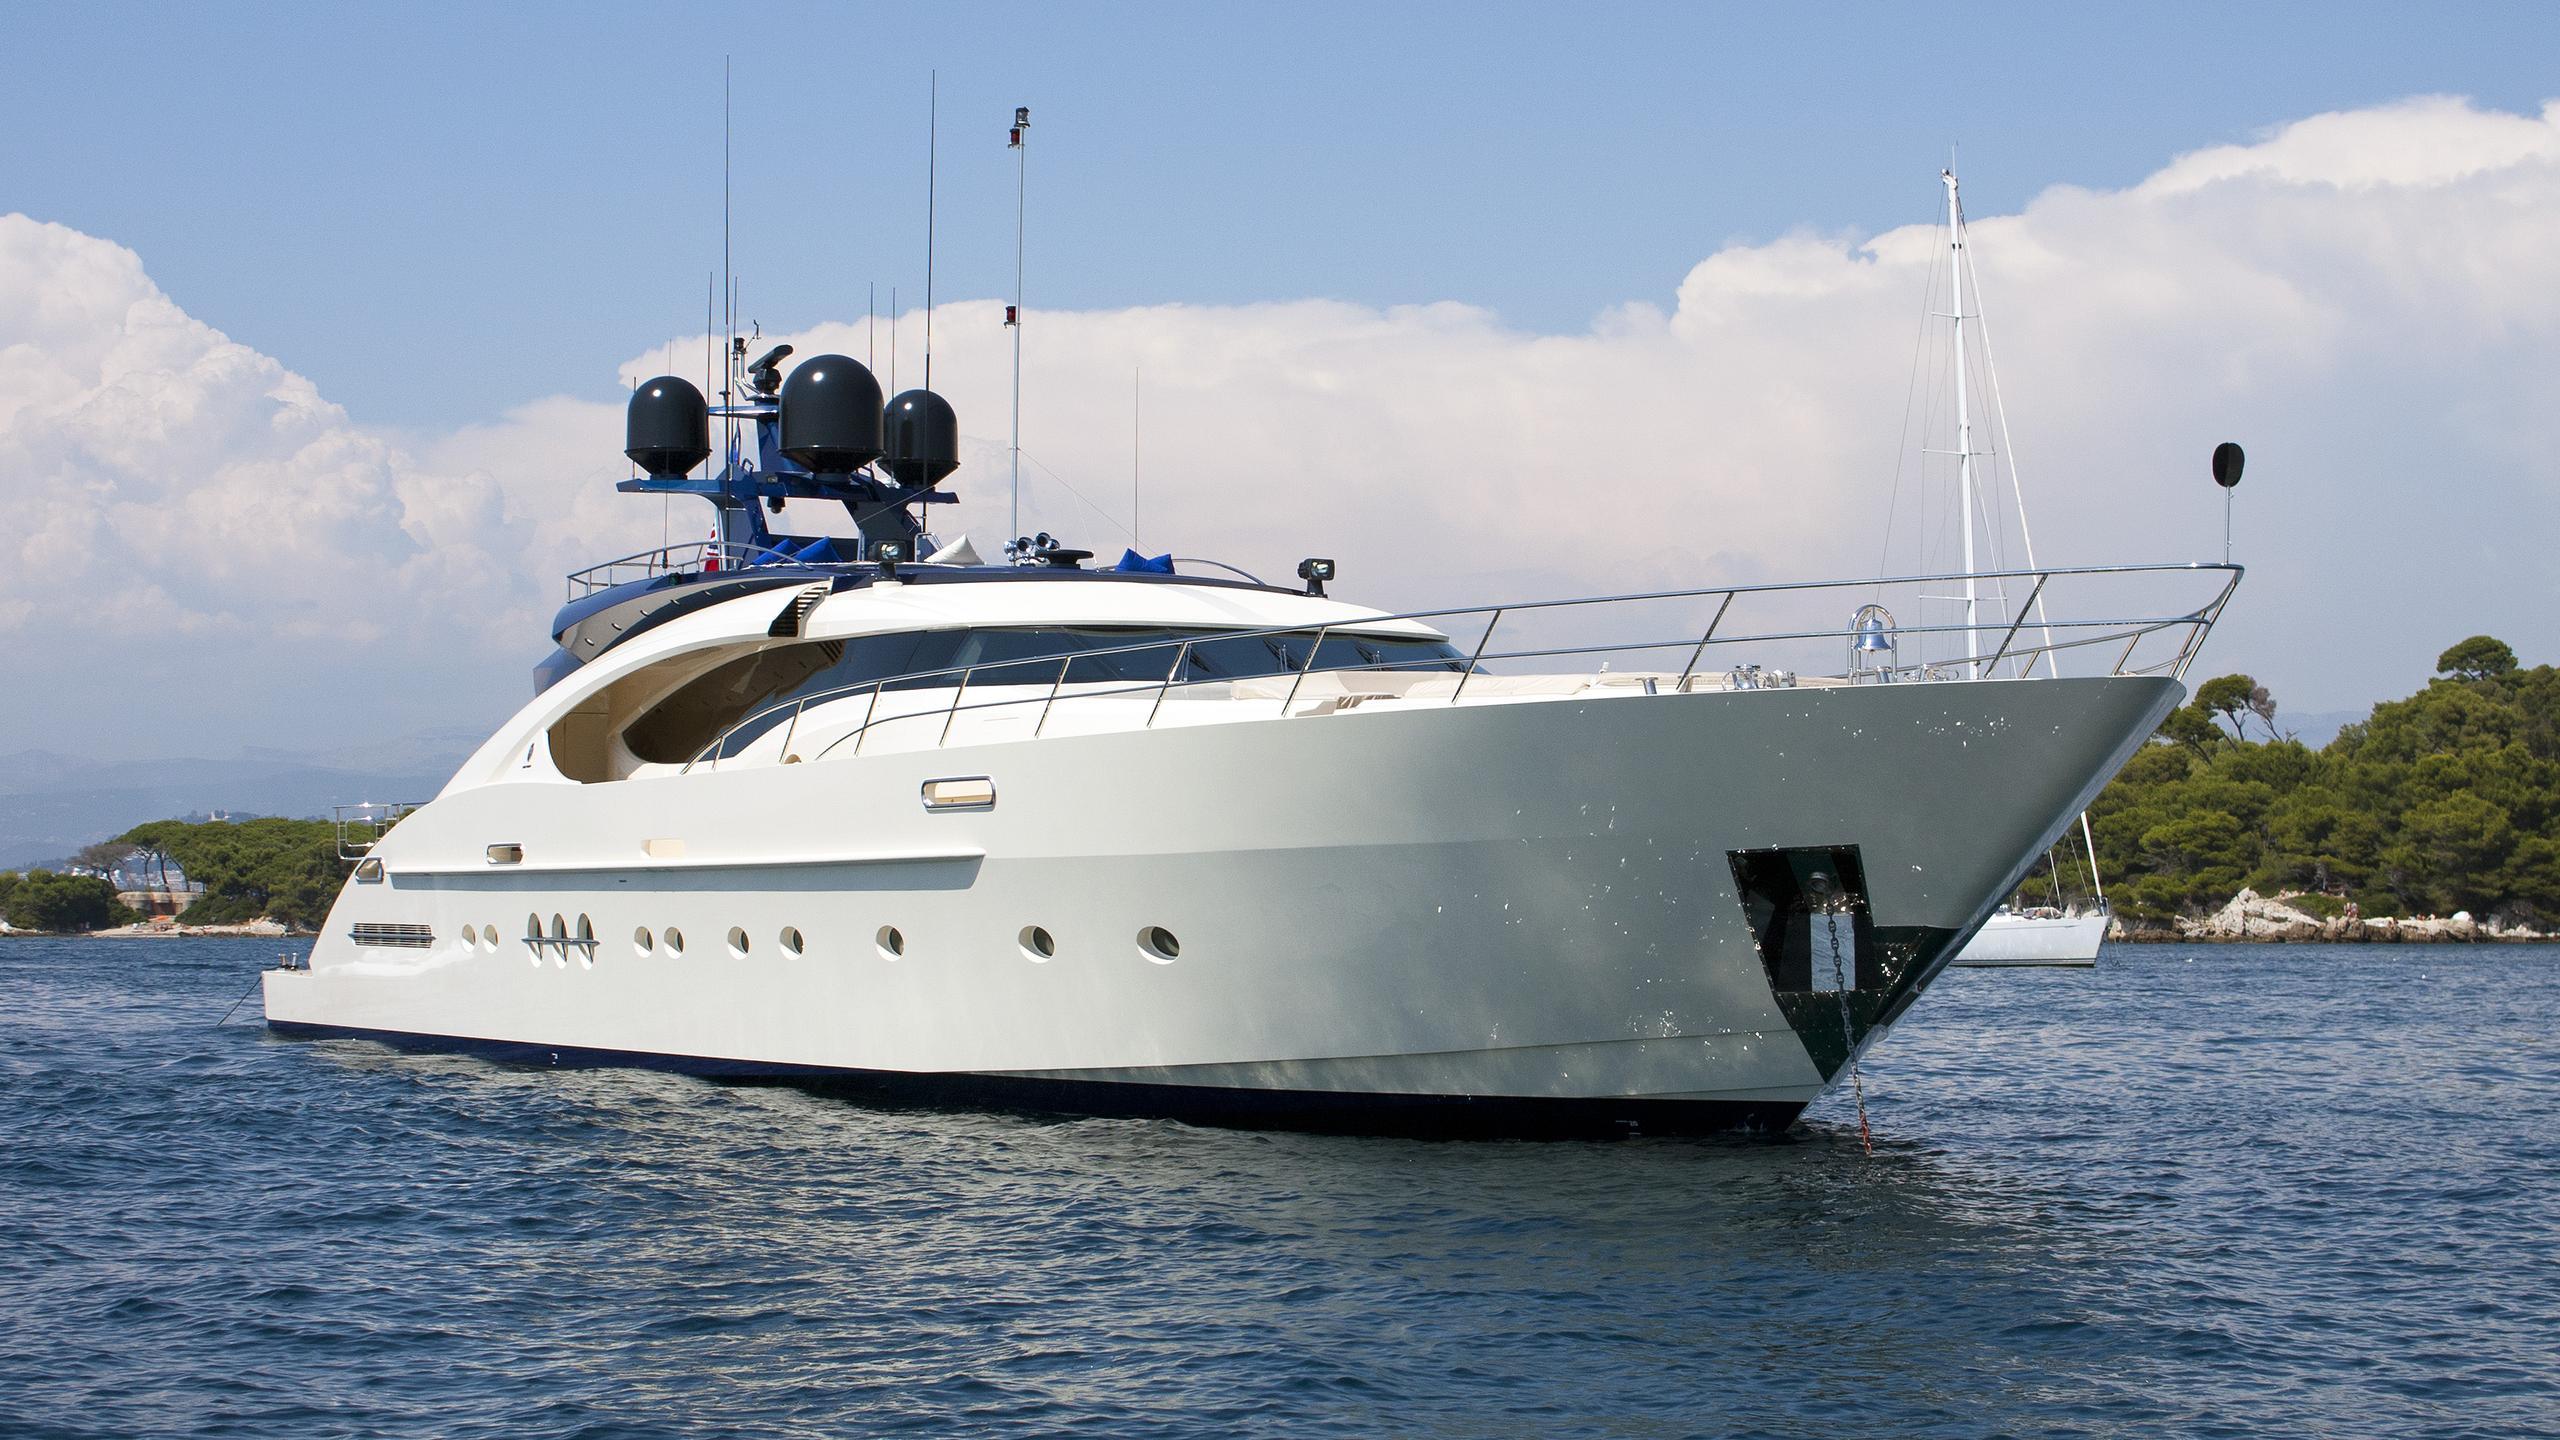 plus-too-motor-yacht-palmer-johnson-135-my-2008-41m-half-profile